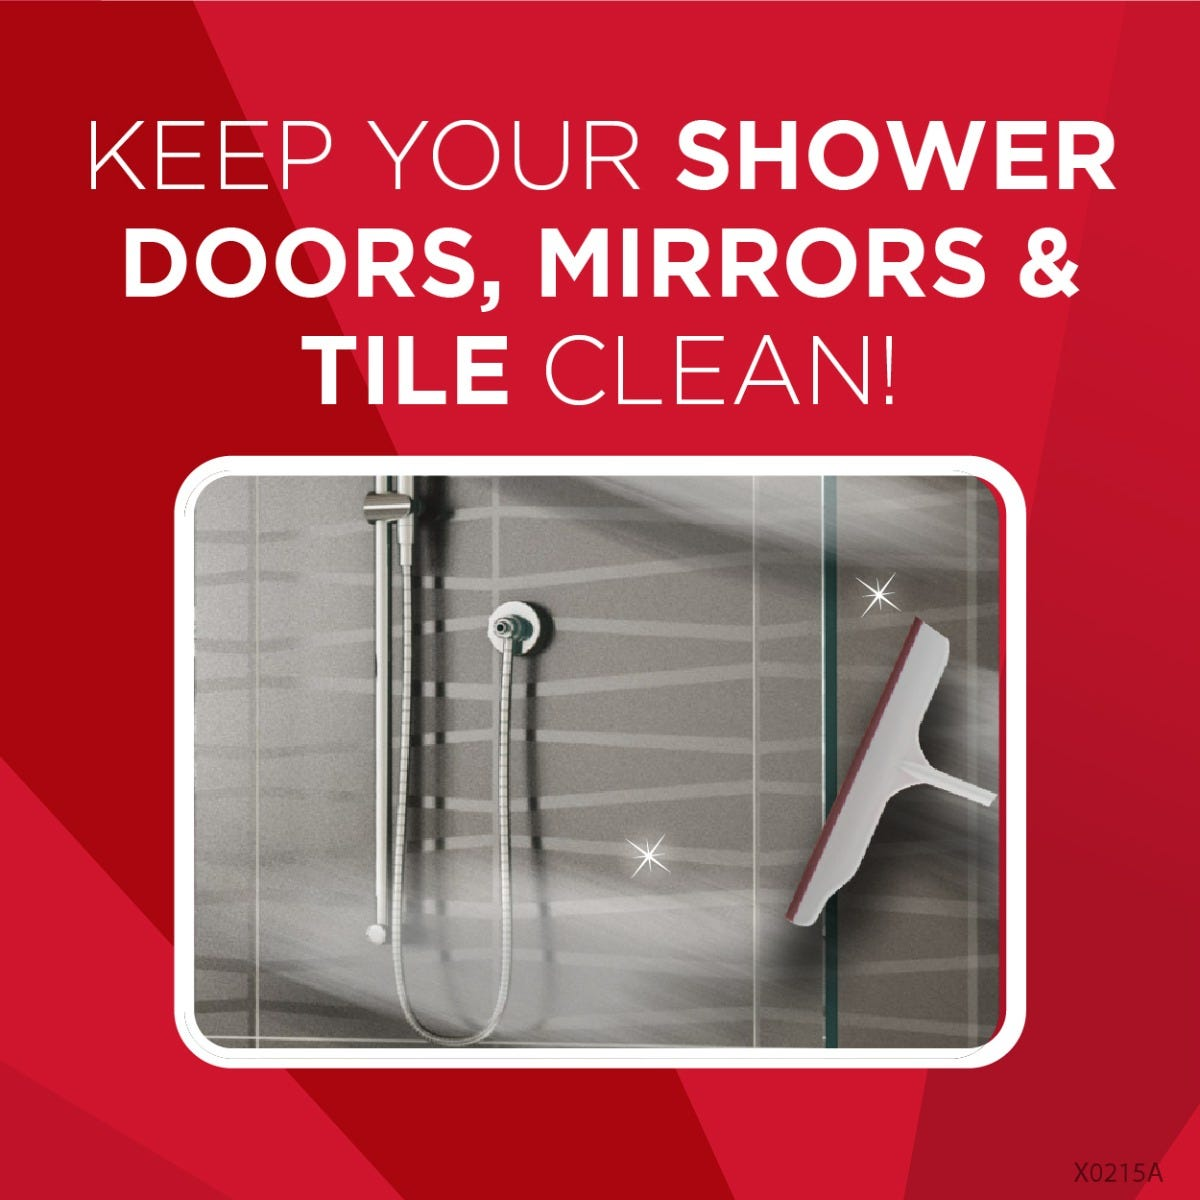 https://googone.com/media/catalog/product/s/q/squeegee_for_shower_doors.jpg